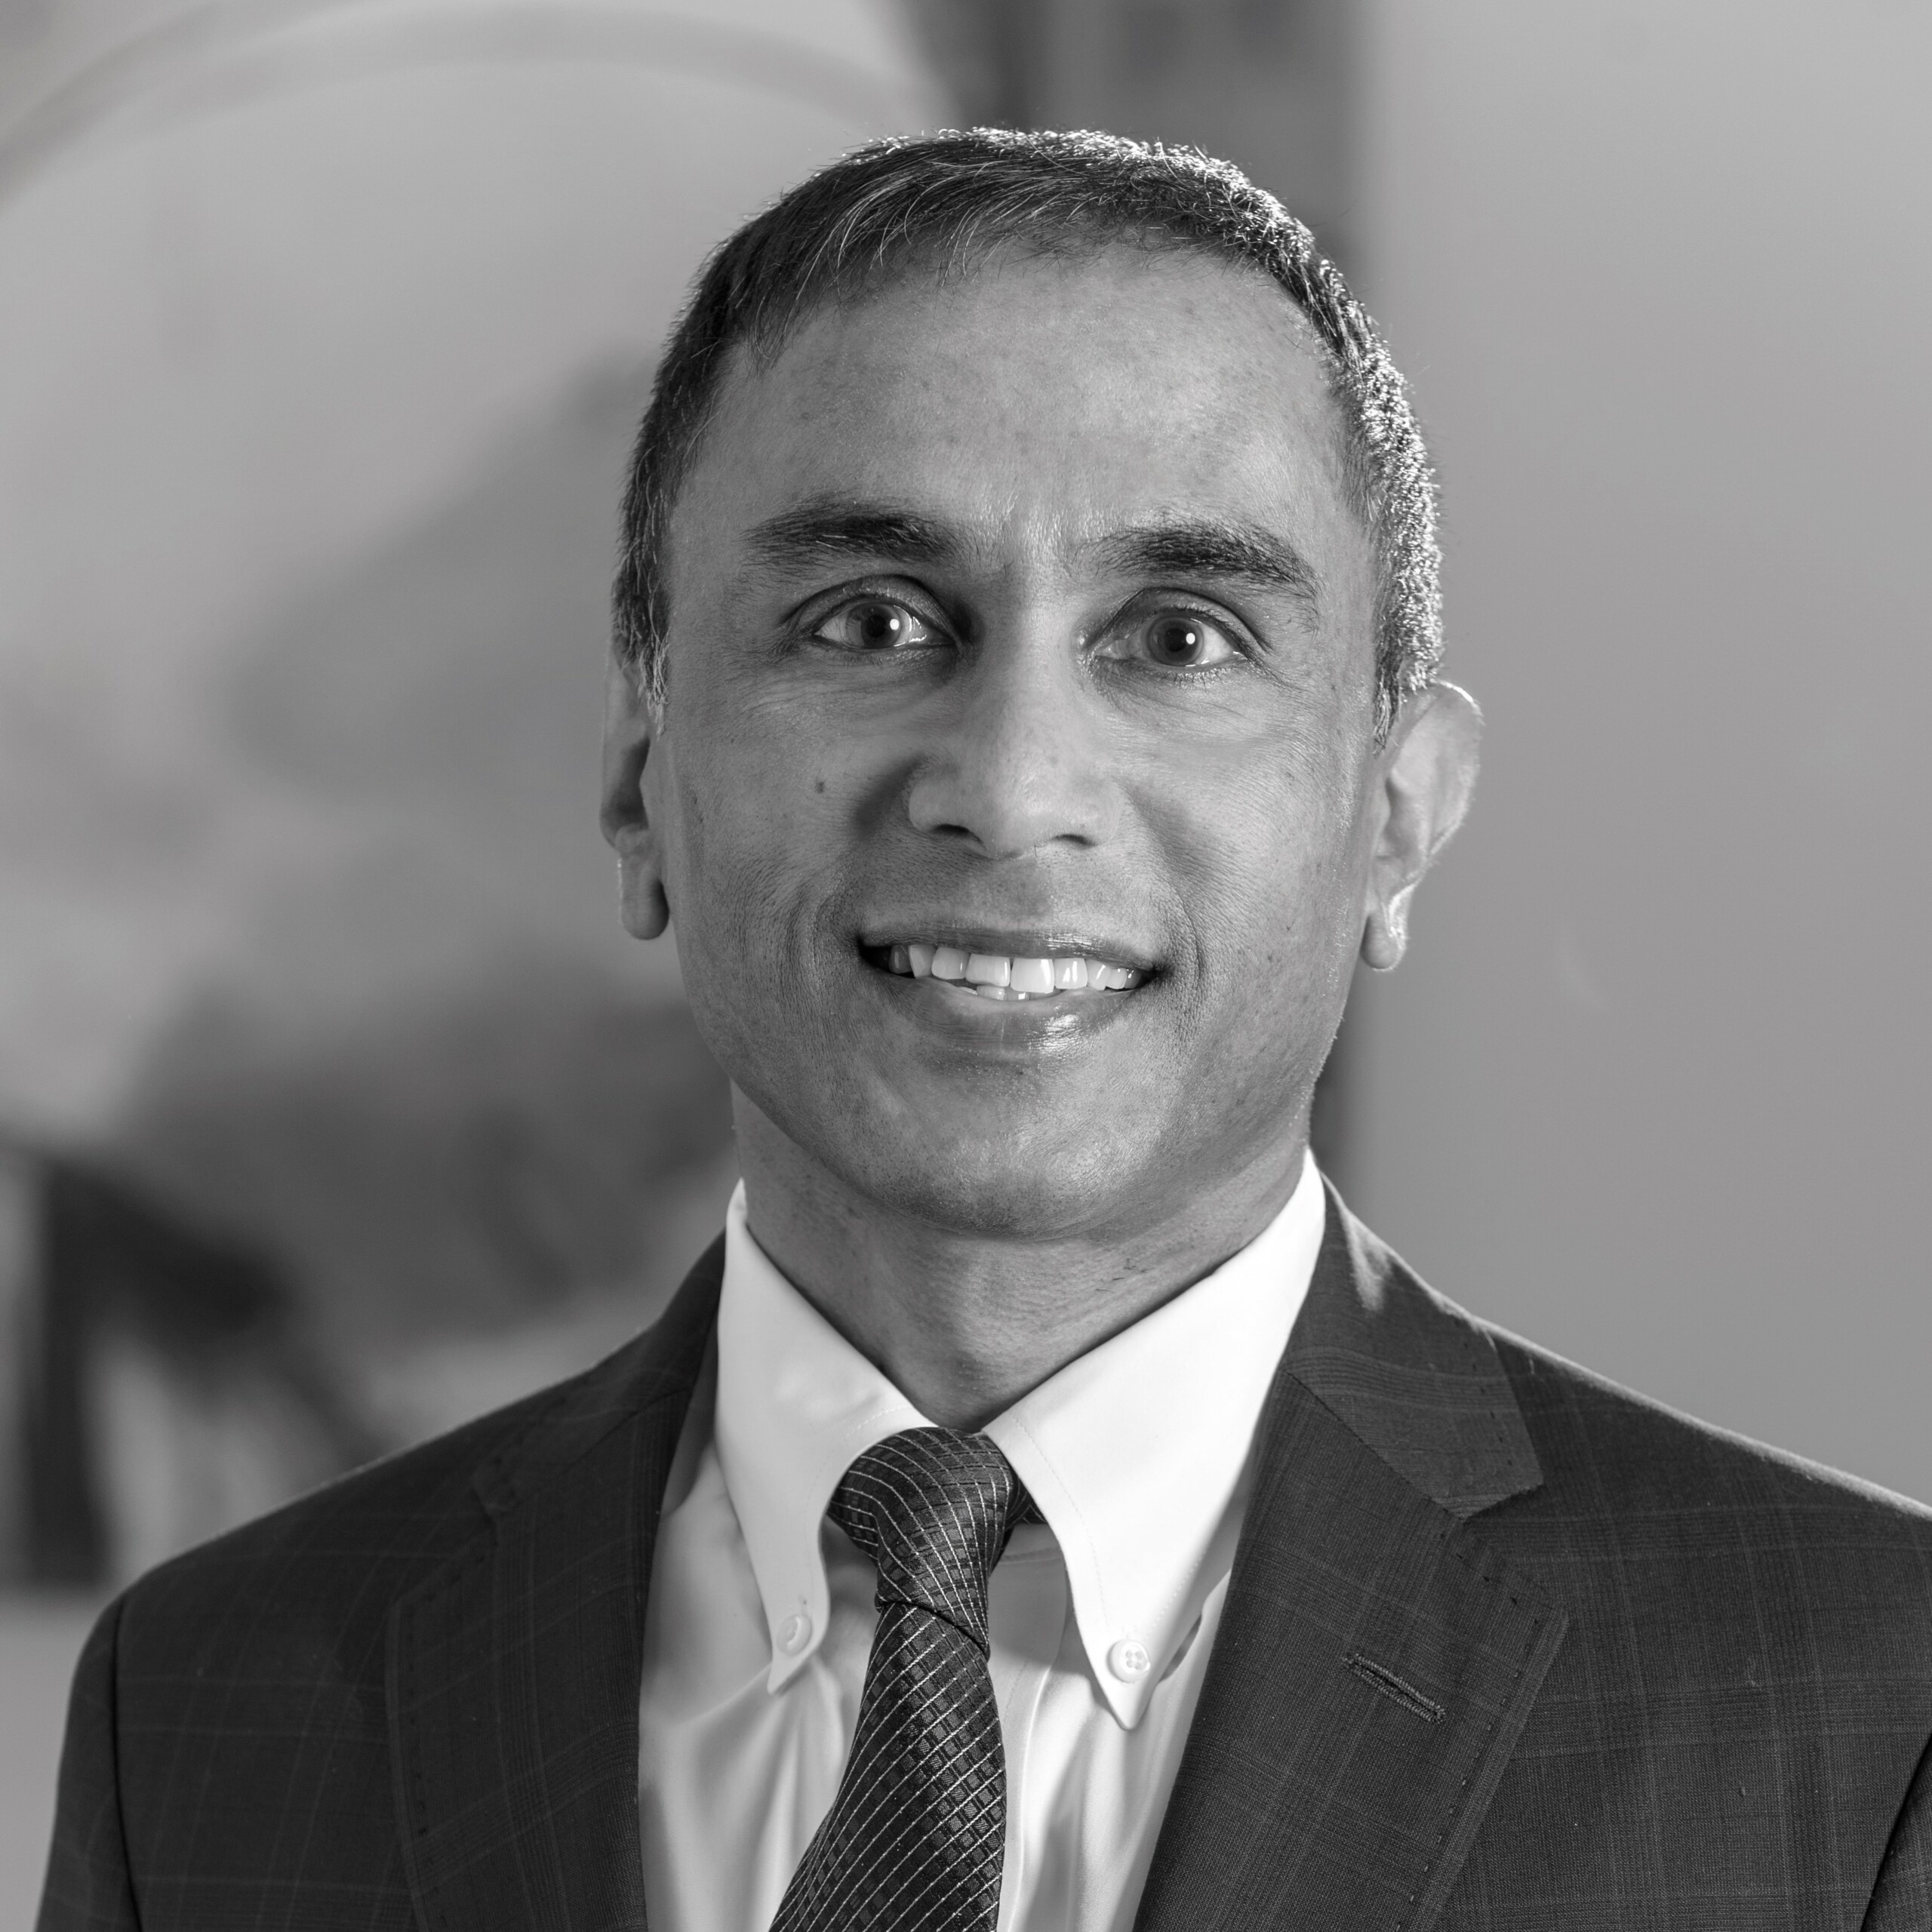 Dr. Shekar Dheenan